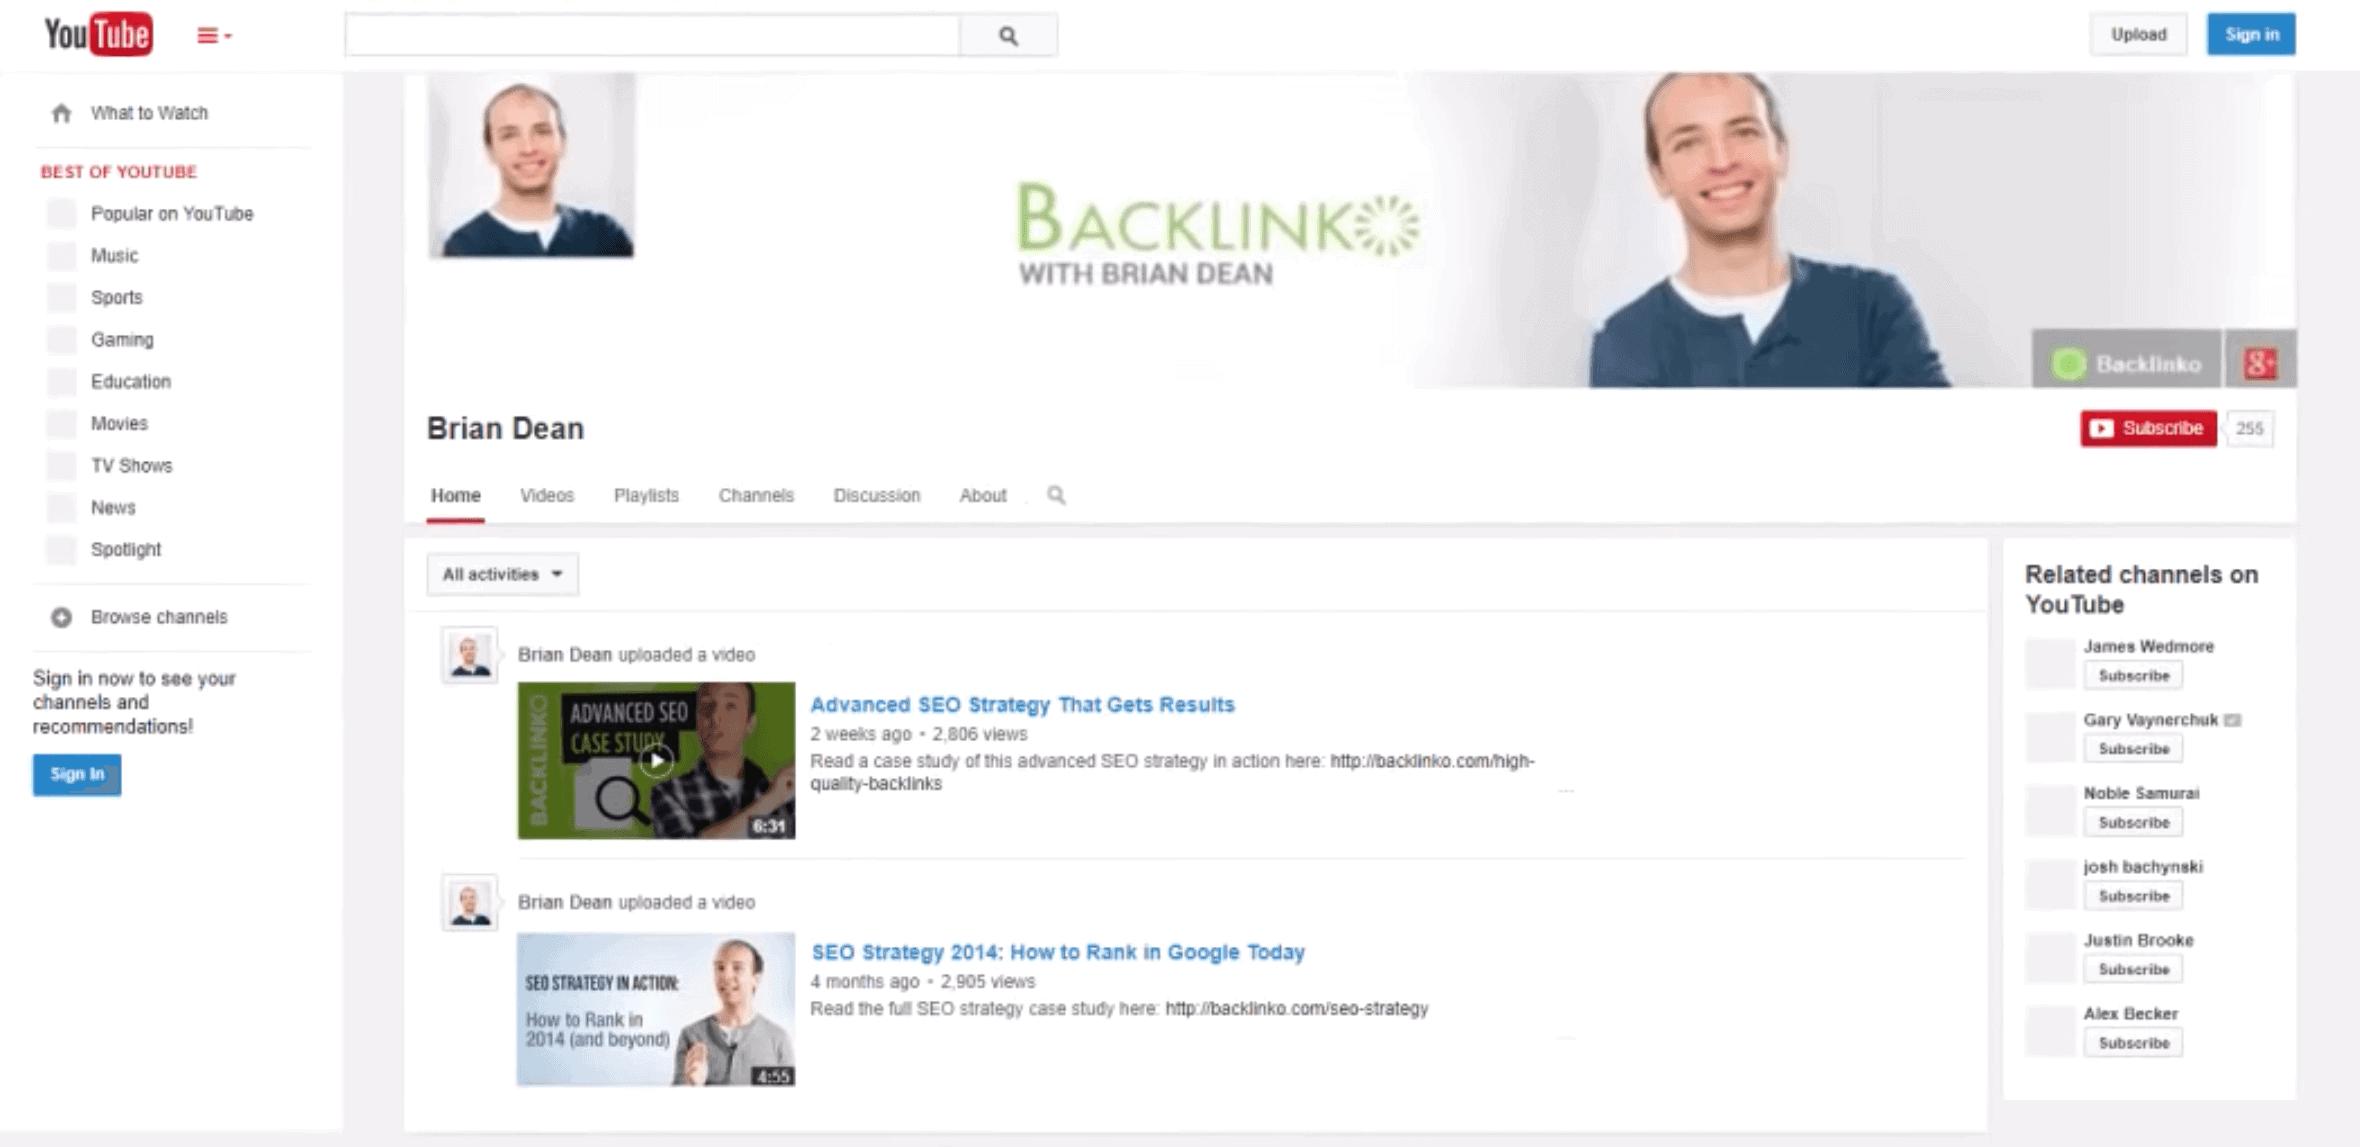 Backlinko – Old YouTube channel